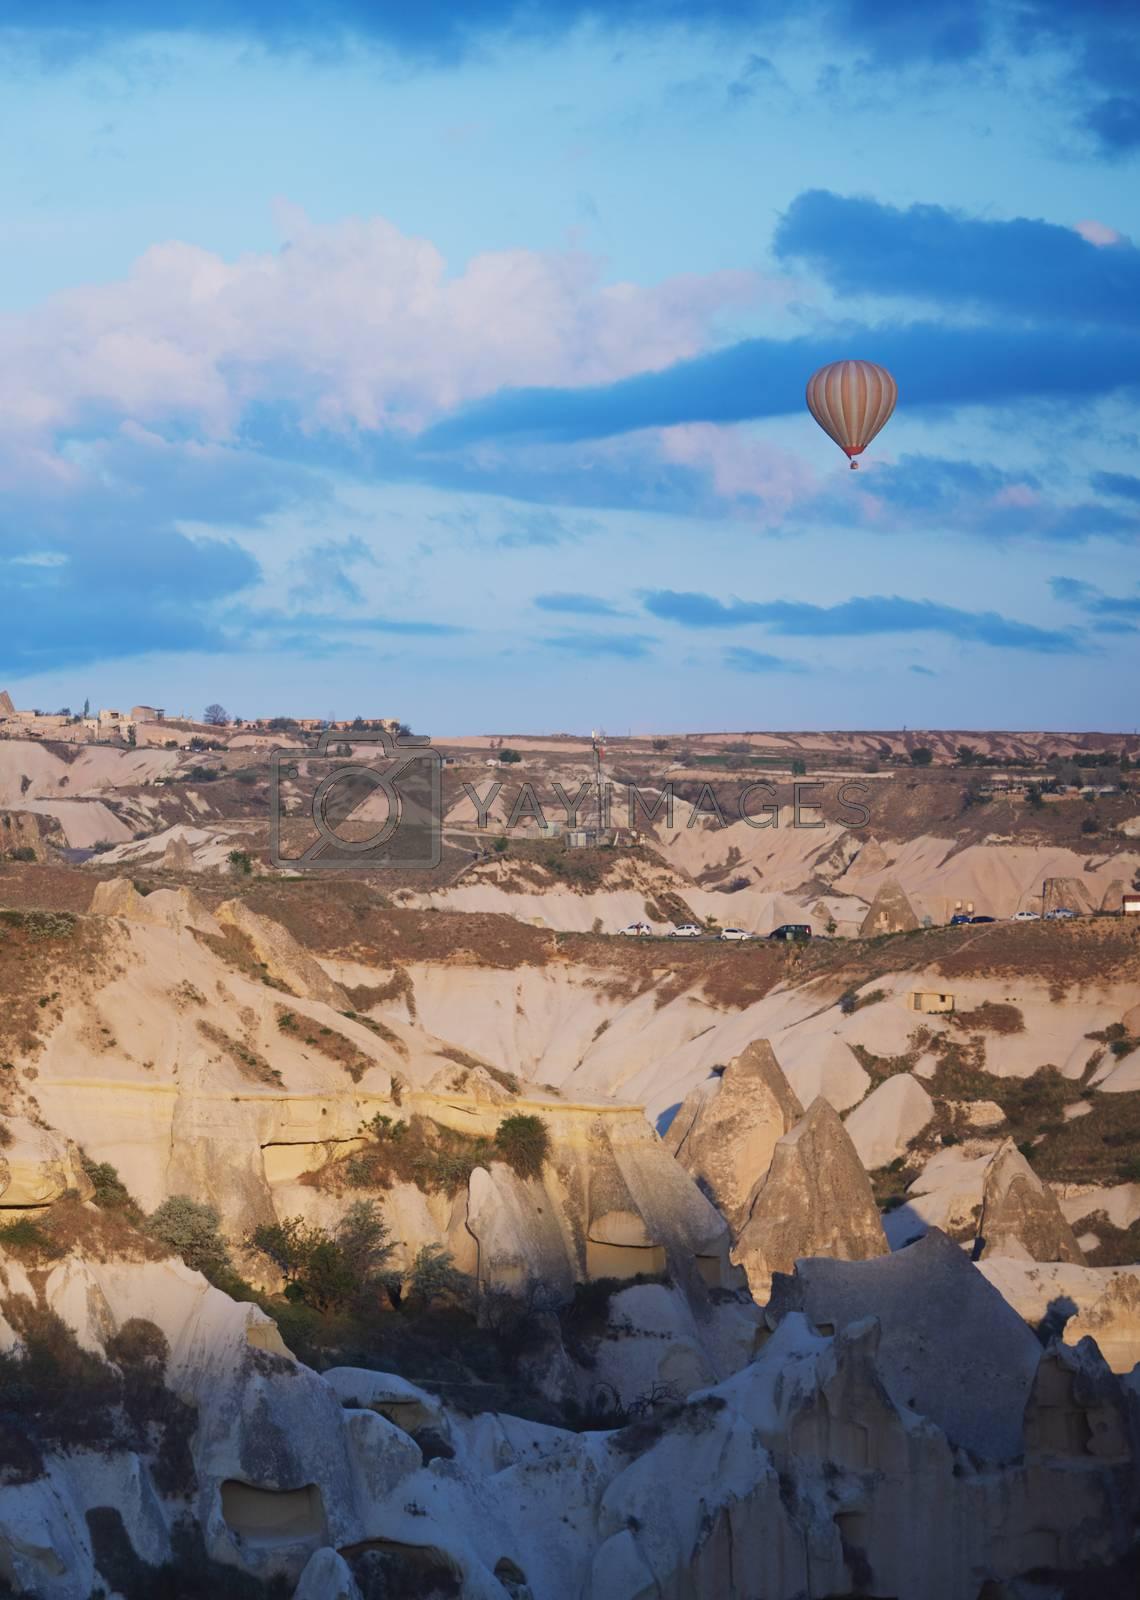 Hot air balloon flying over the rocks of Cappadocia by Novic